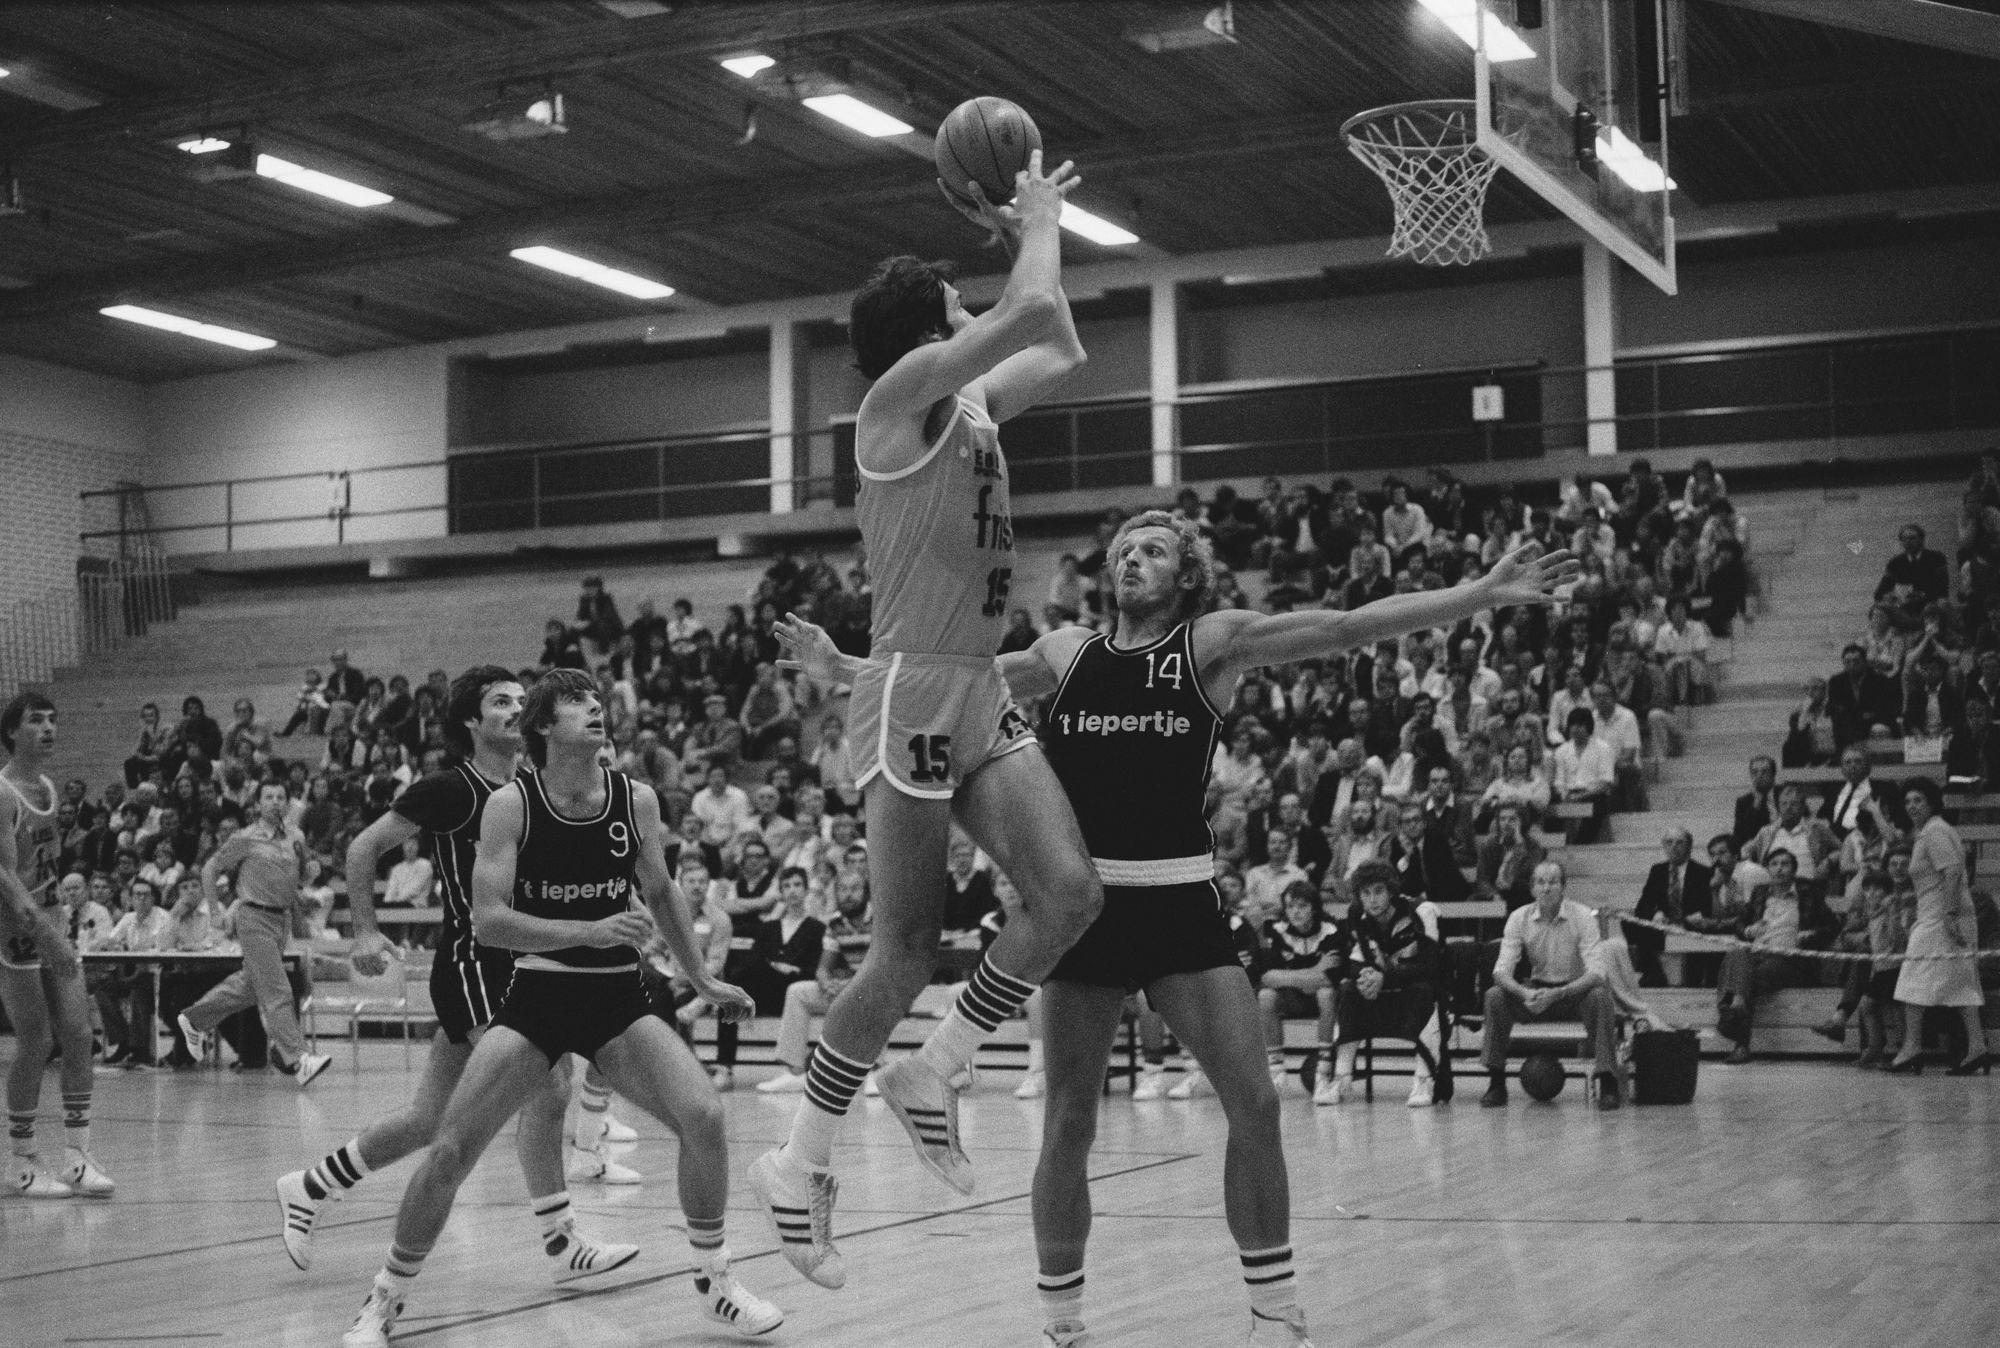 Basketbalmatch tussen FRISA en 't iepertje